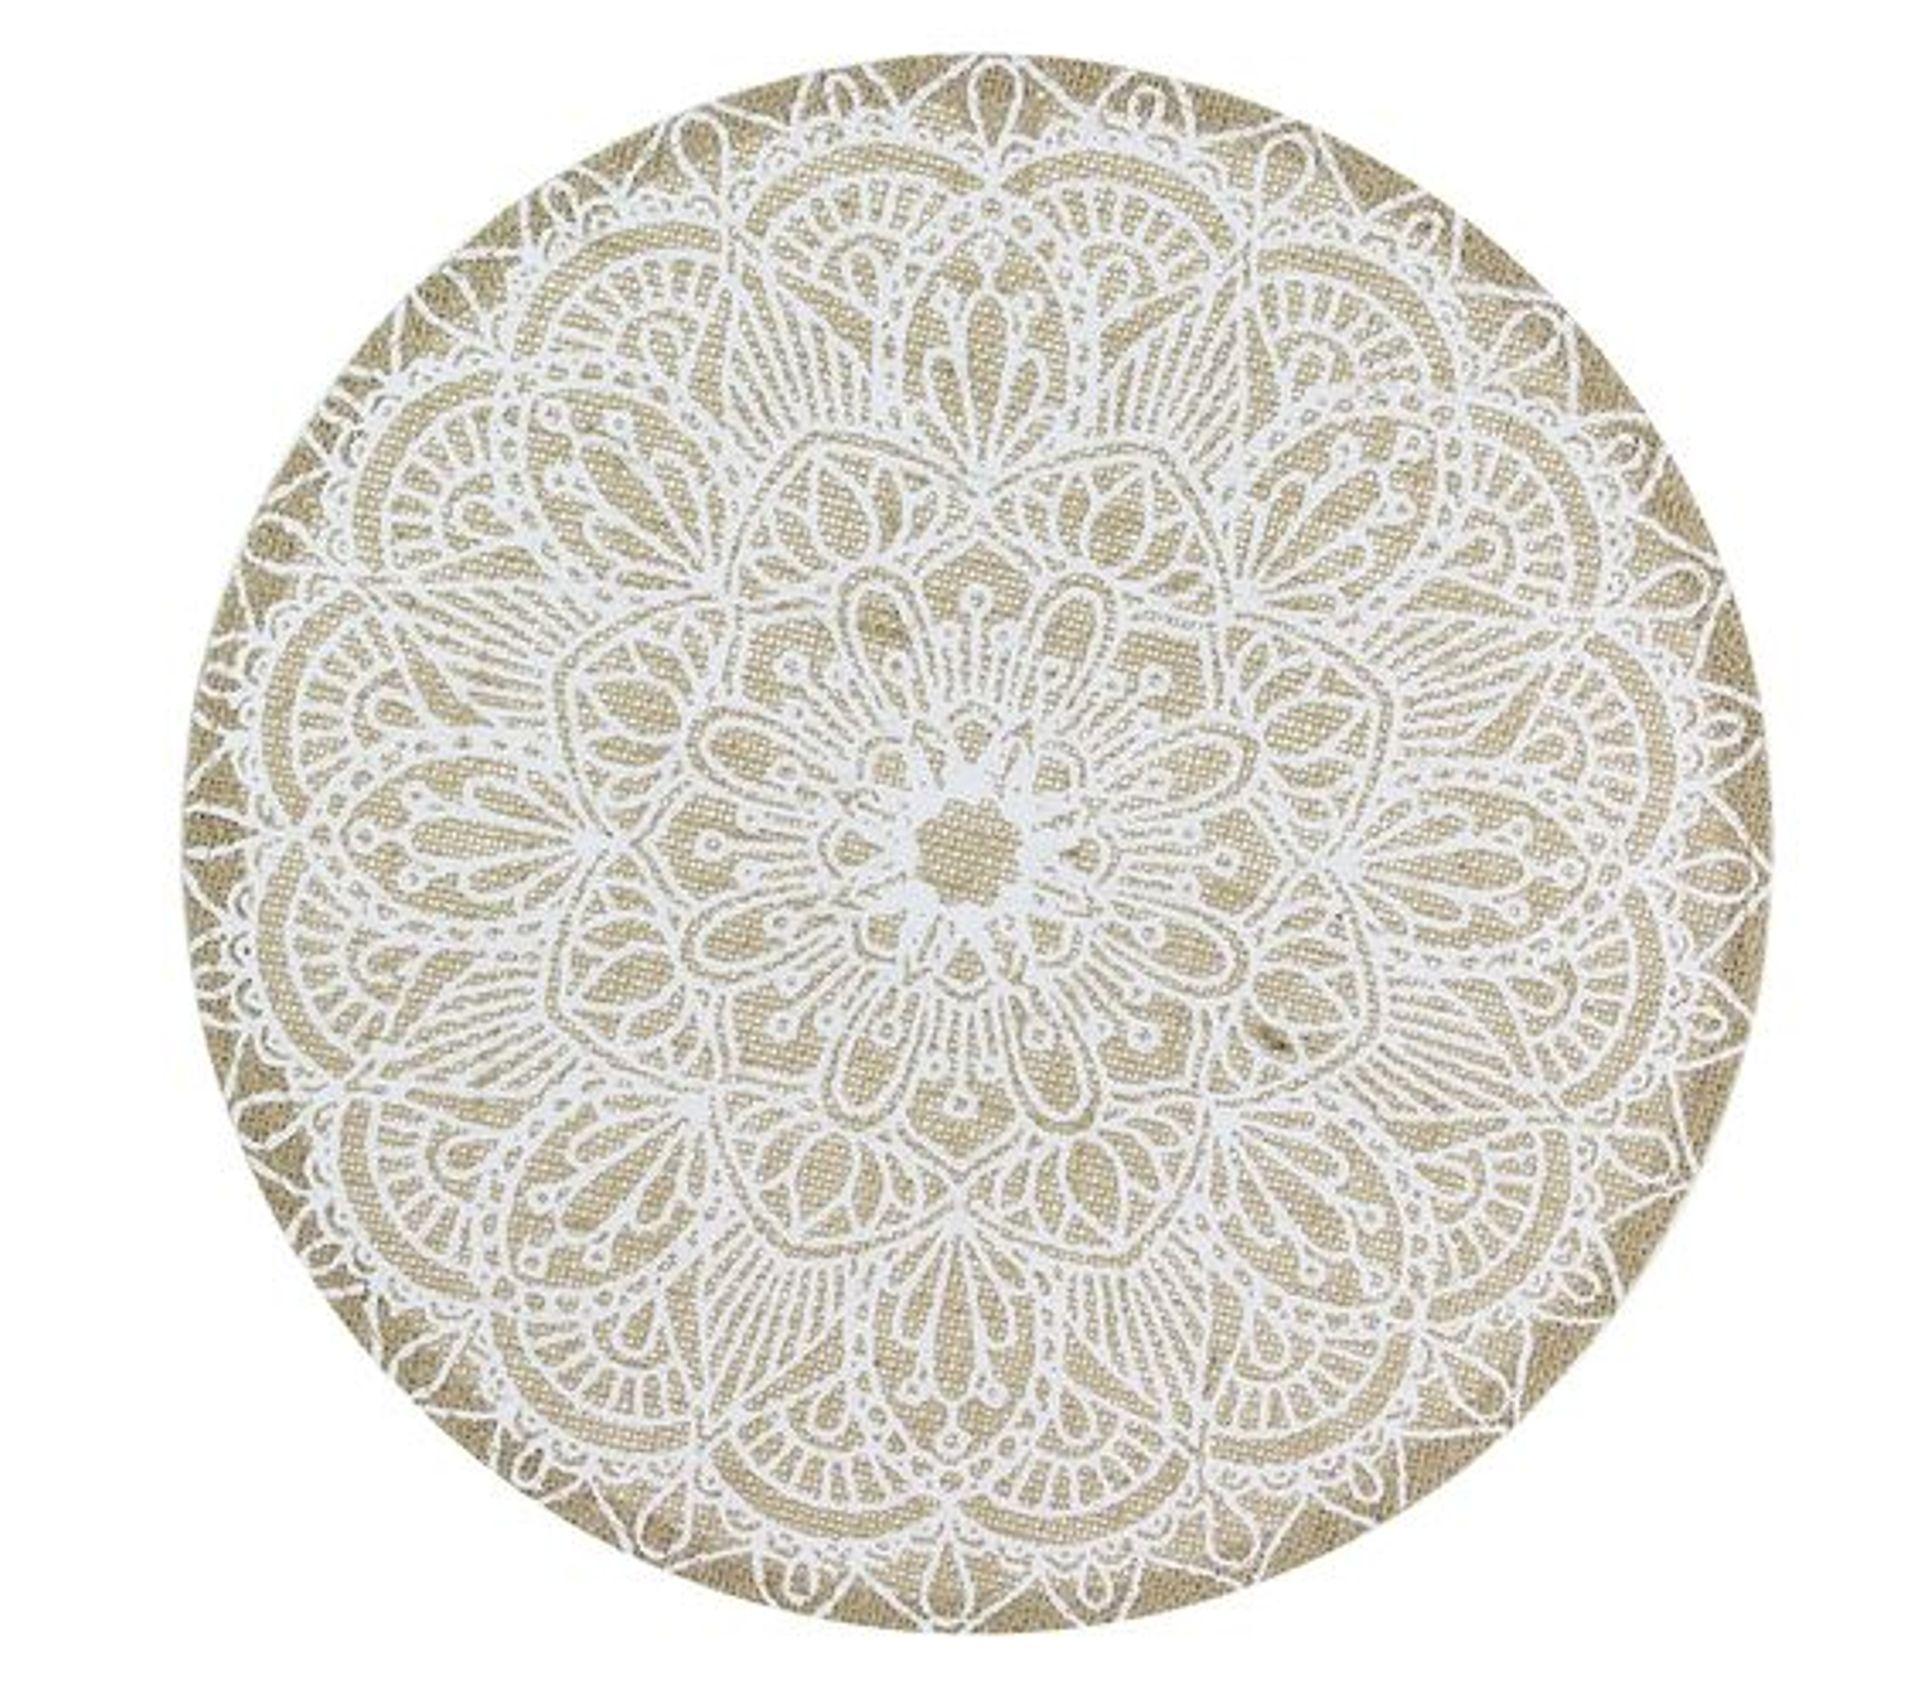 Set De Table En Tissu Ethnical Life Diam 37 Cm Blanc Et Beige